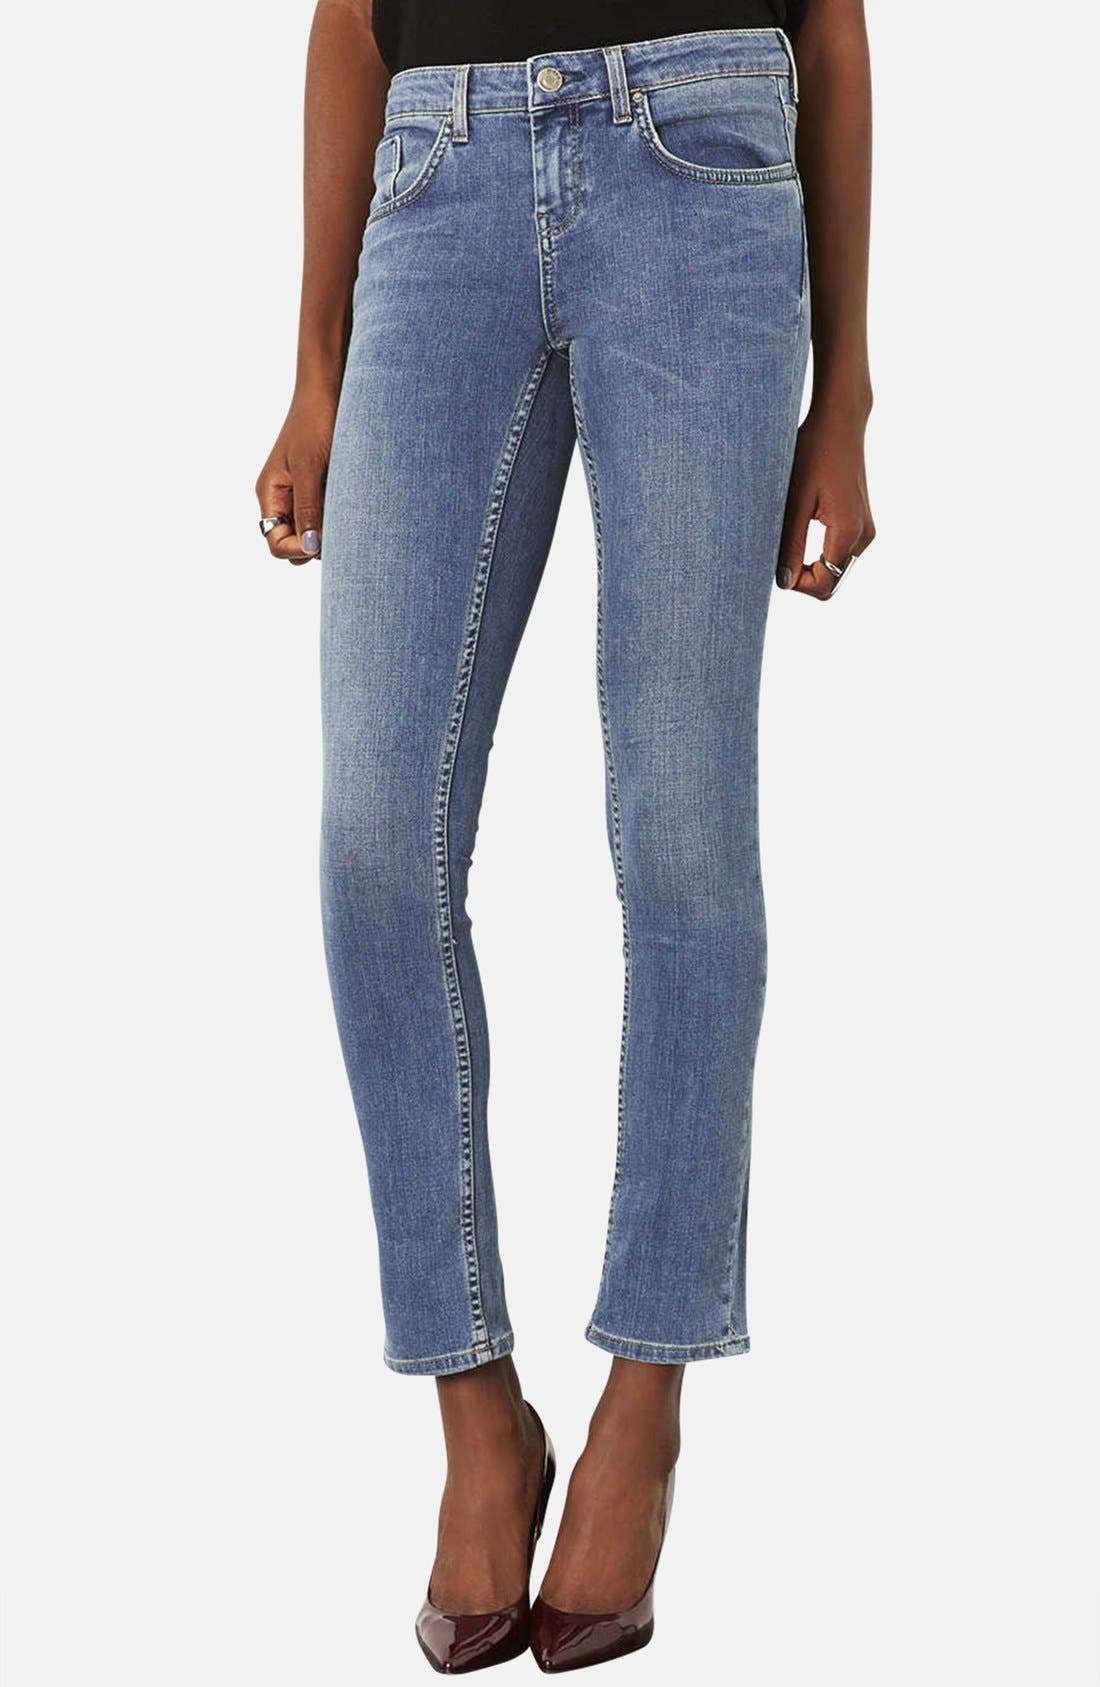 Main Image - Topshop Moto 'Vintage Baxter' Skinny Jeans (Mid Stone) (Short)